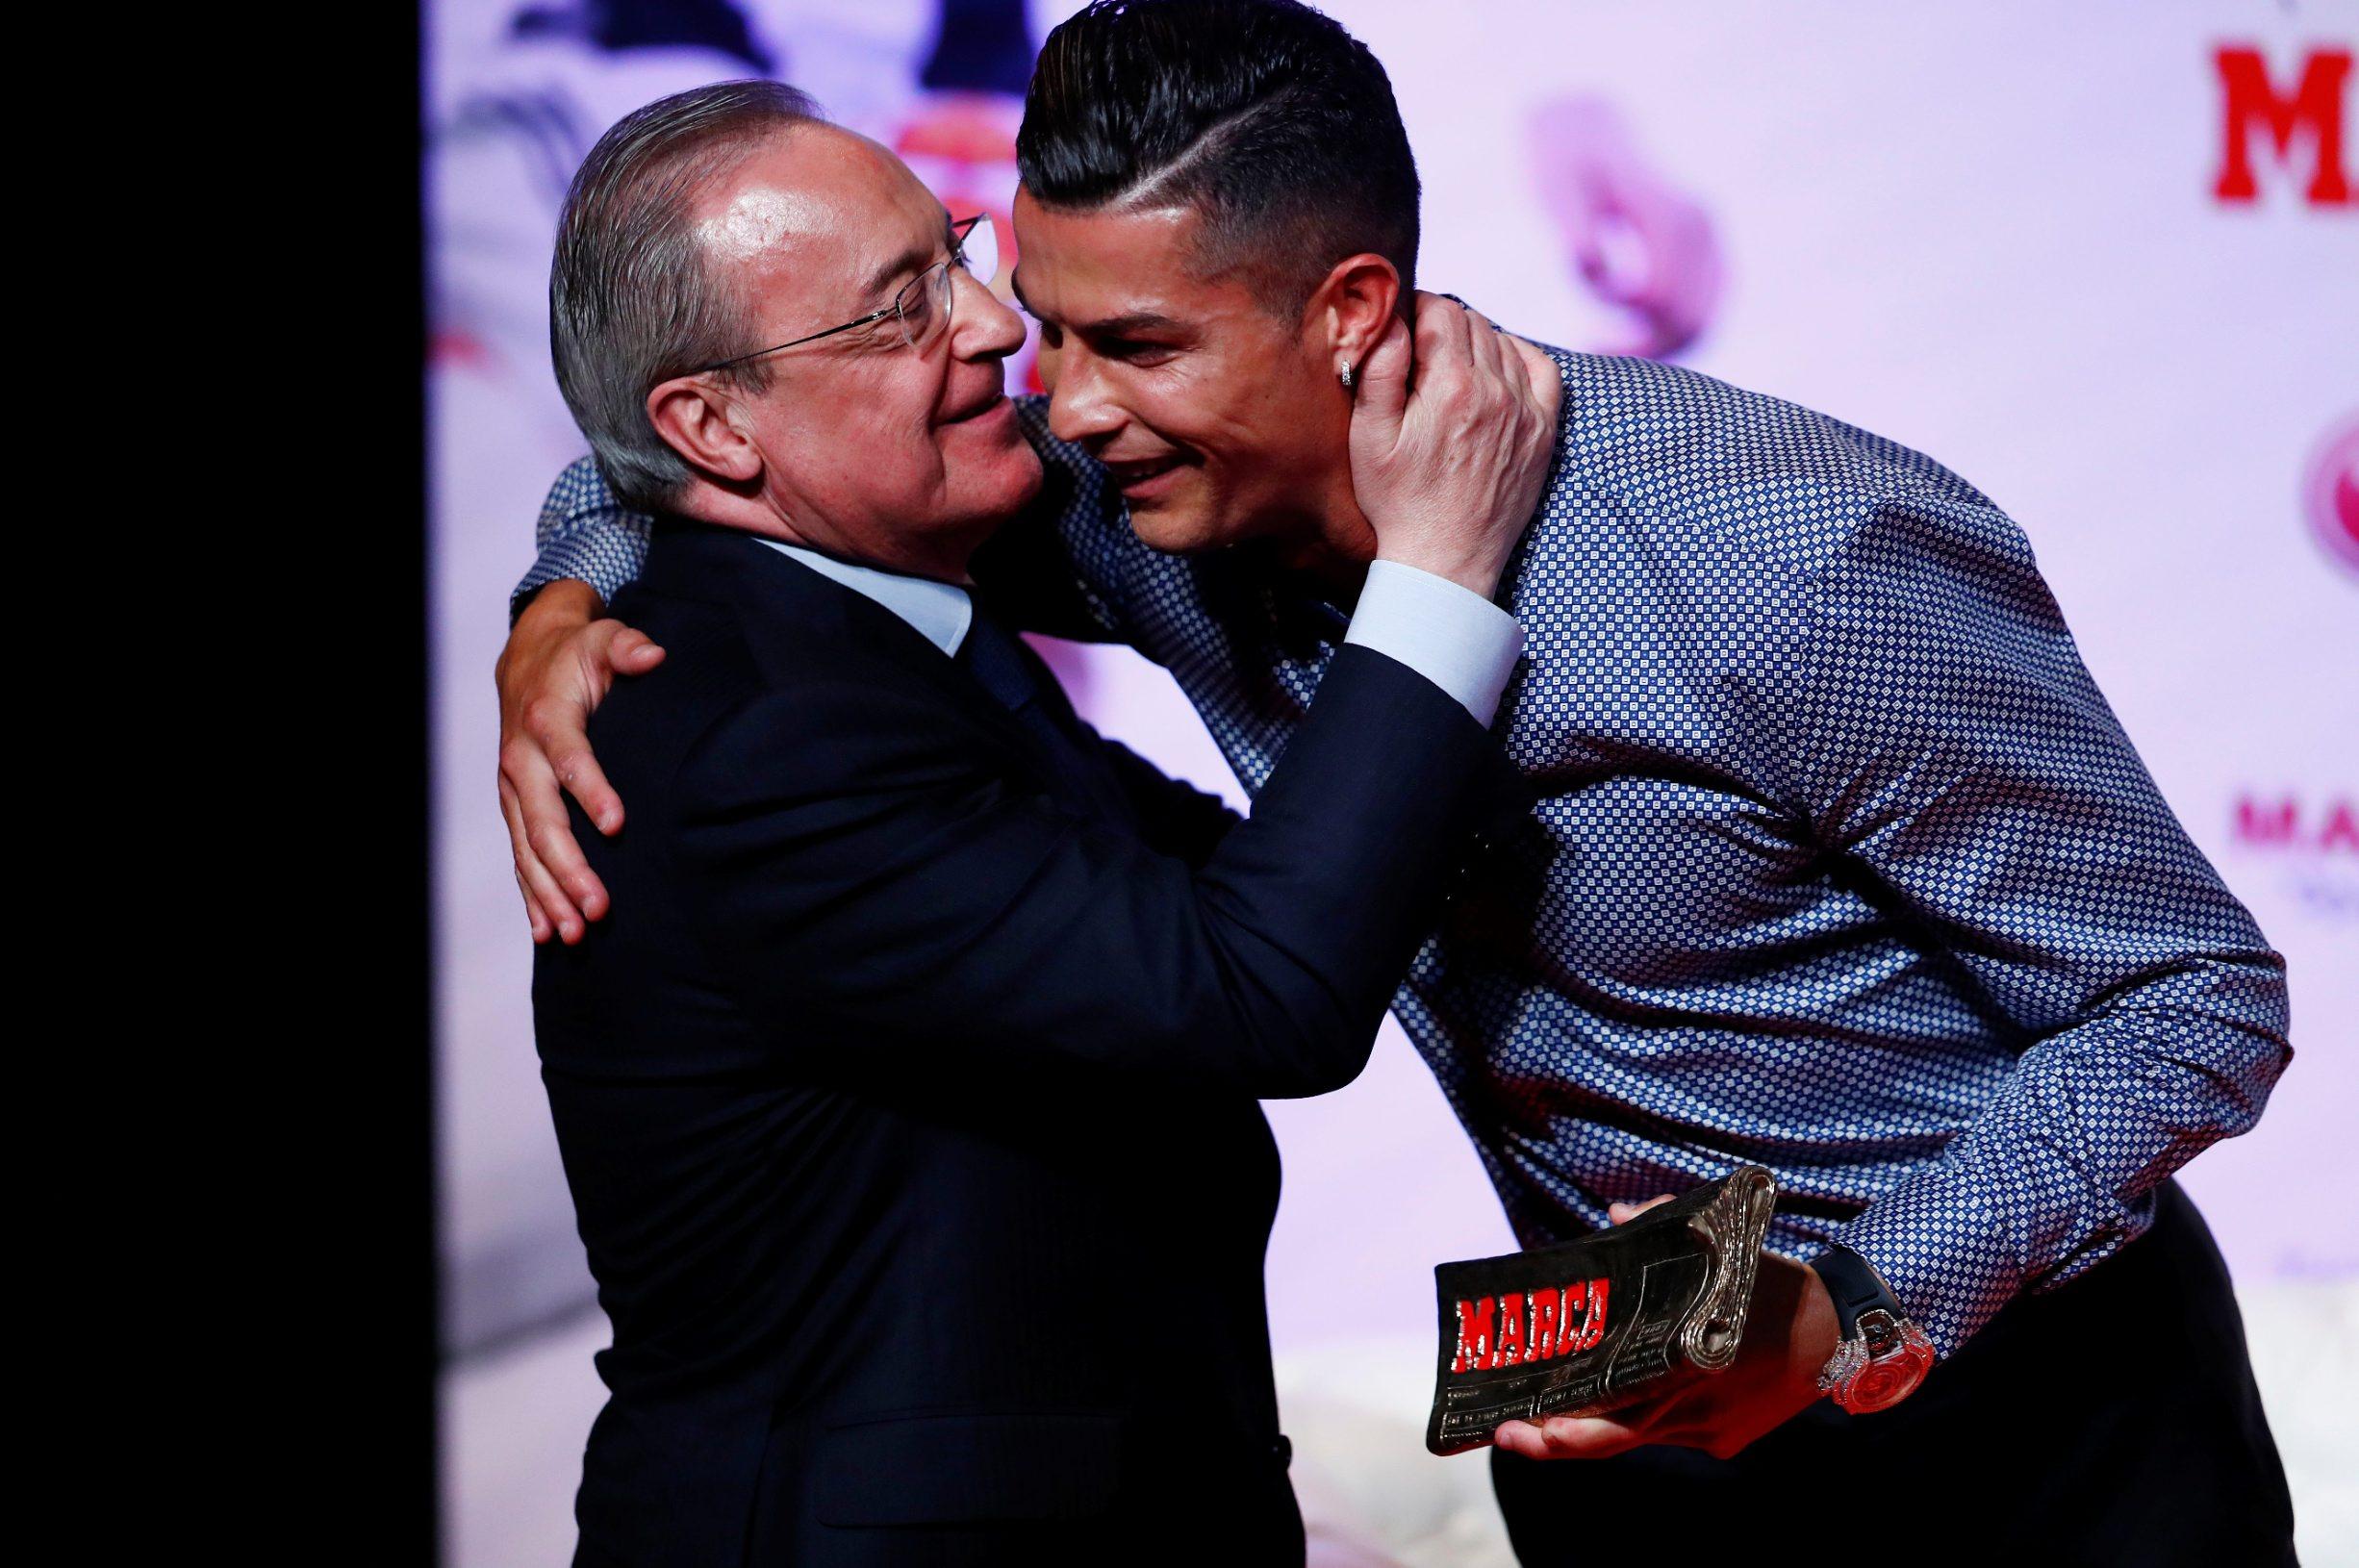 Soccer Football - Cristiano Ronaldo receives the MARCA Legend award - Reina Victoria Theater, Madrid, Spain - July 29, 2019   Cristiano Ronaldo embraces Real Madrid president Florentino Perez during the presentation   REUTERS/Juan Medina